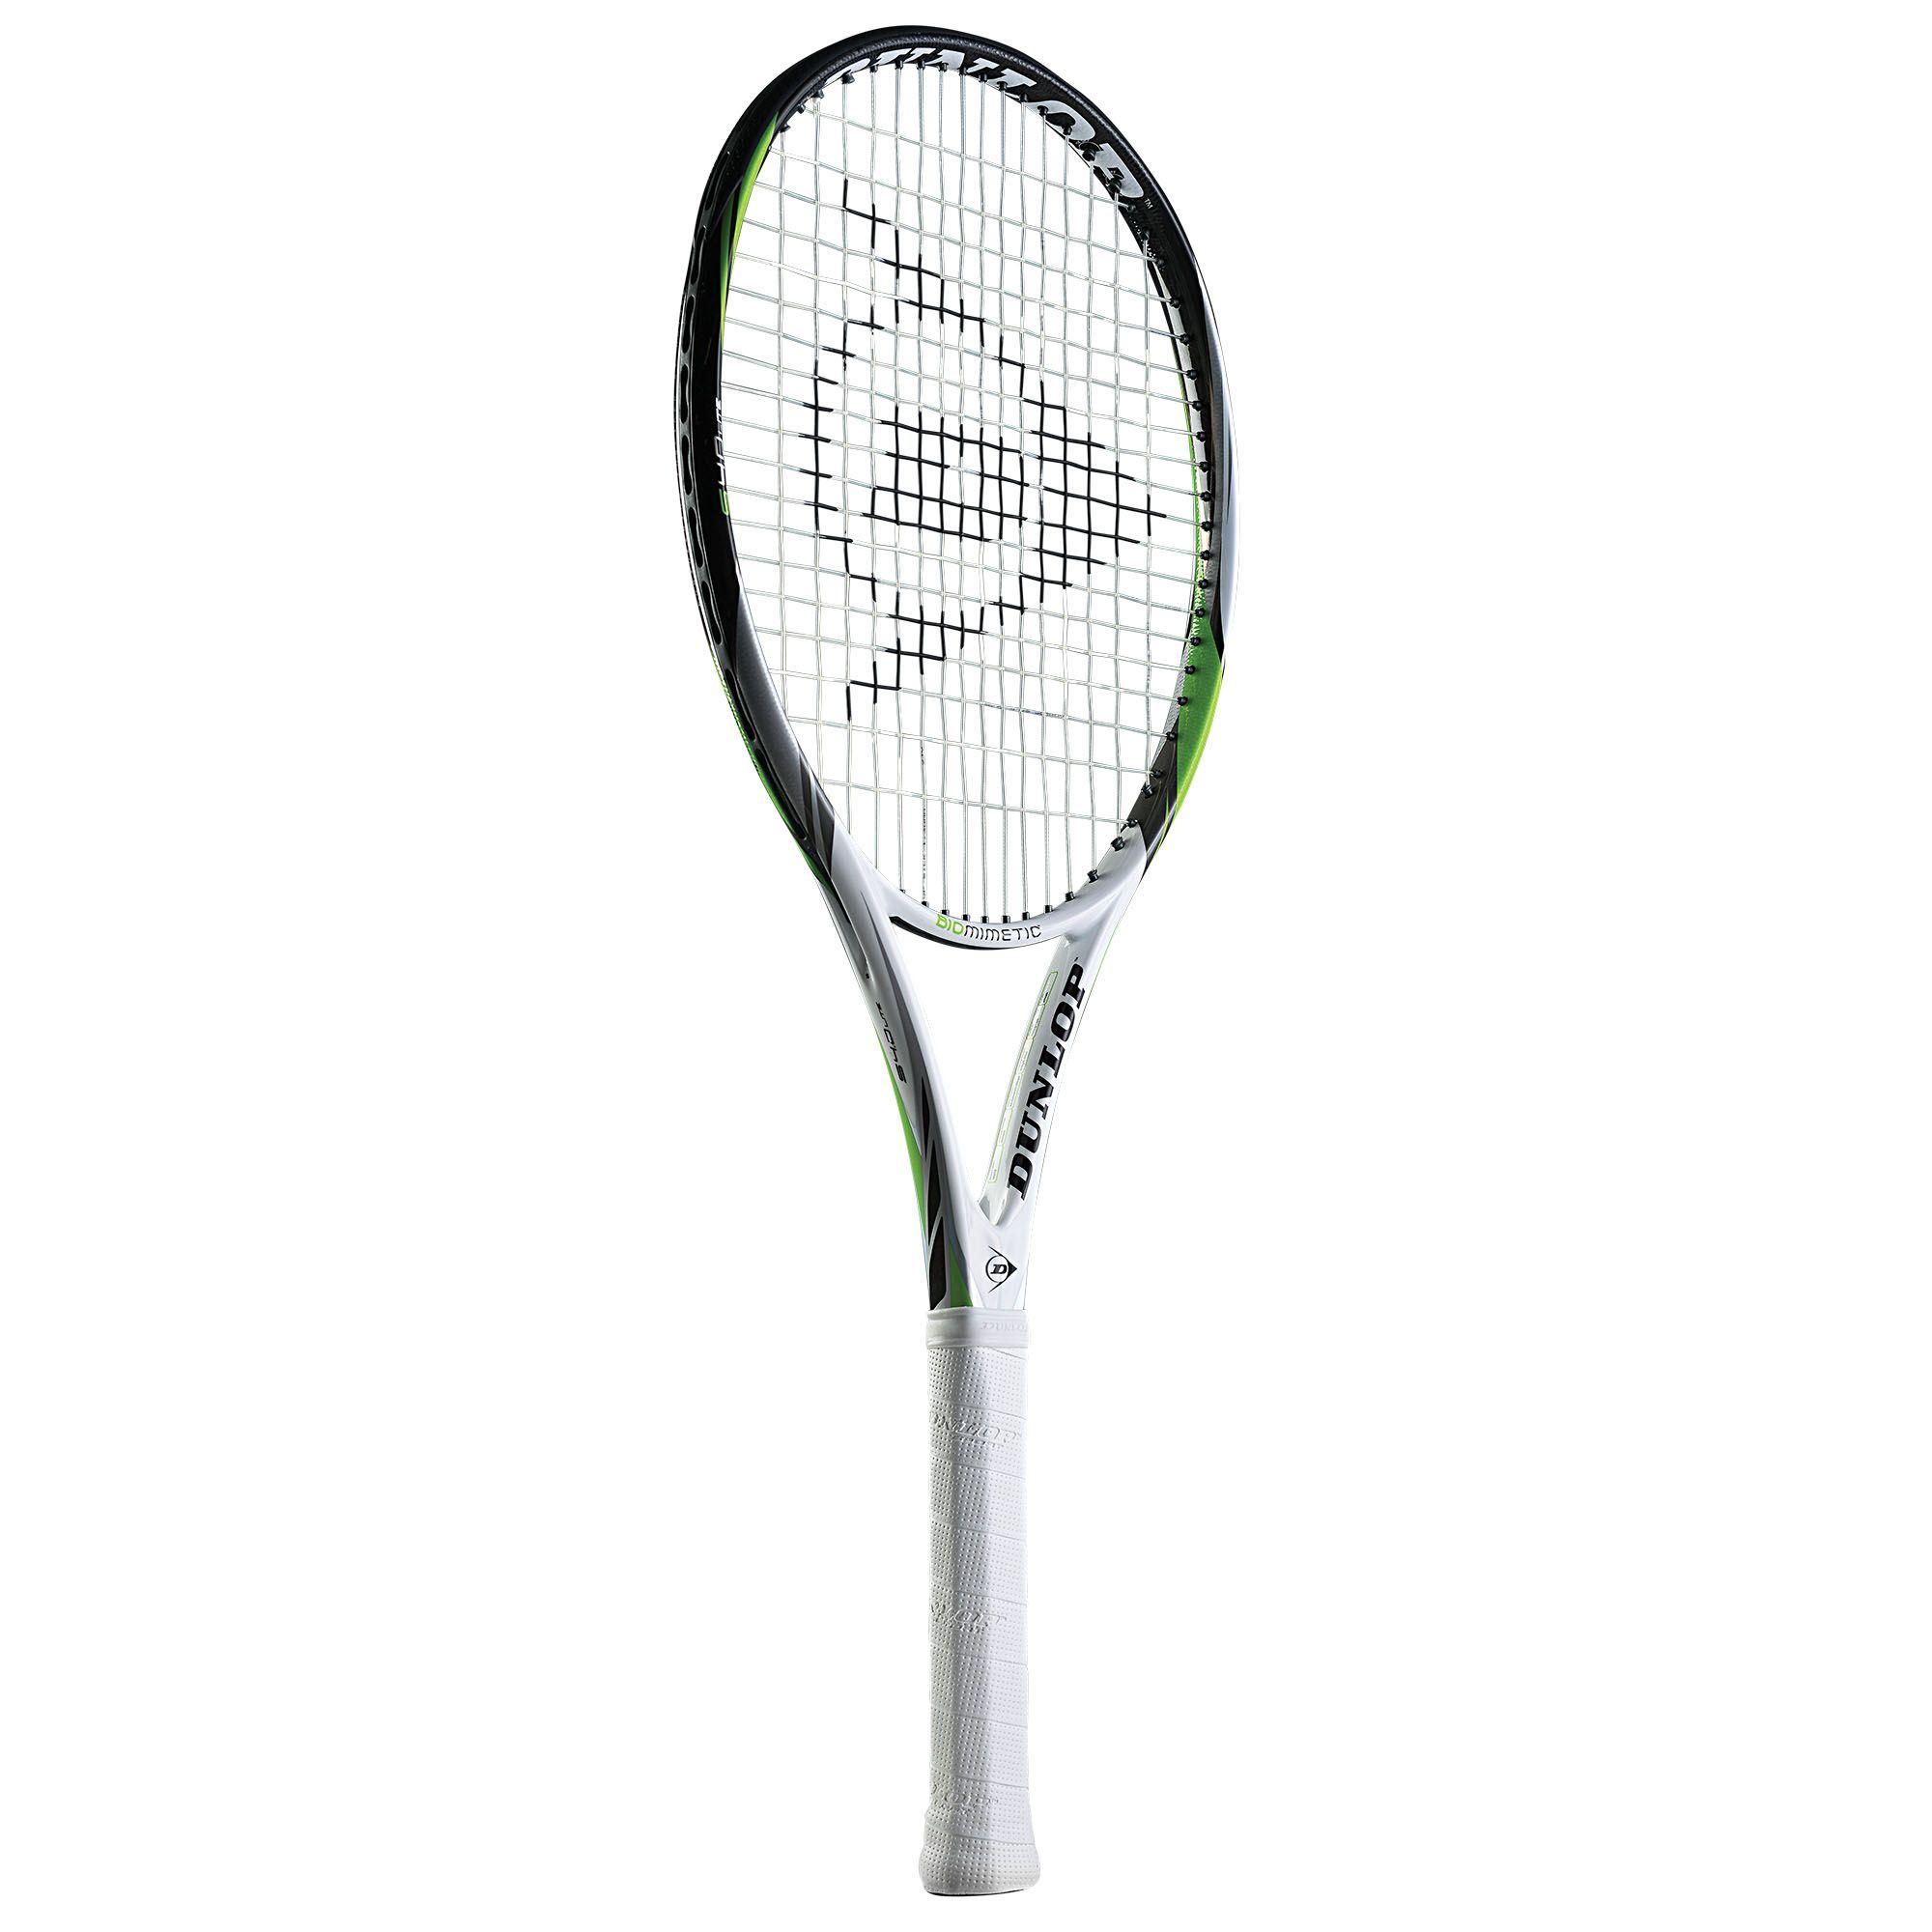 Dunlop Biomimetic S4 0 Lite Tennis Racket Sweatband Com